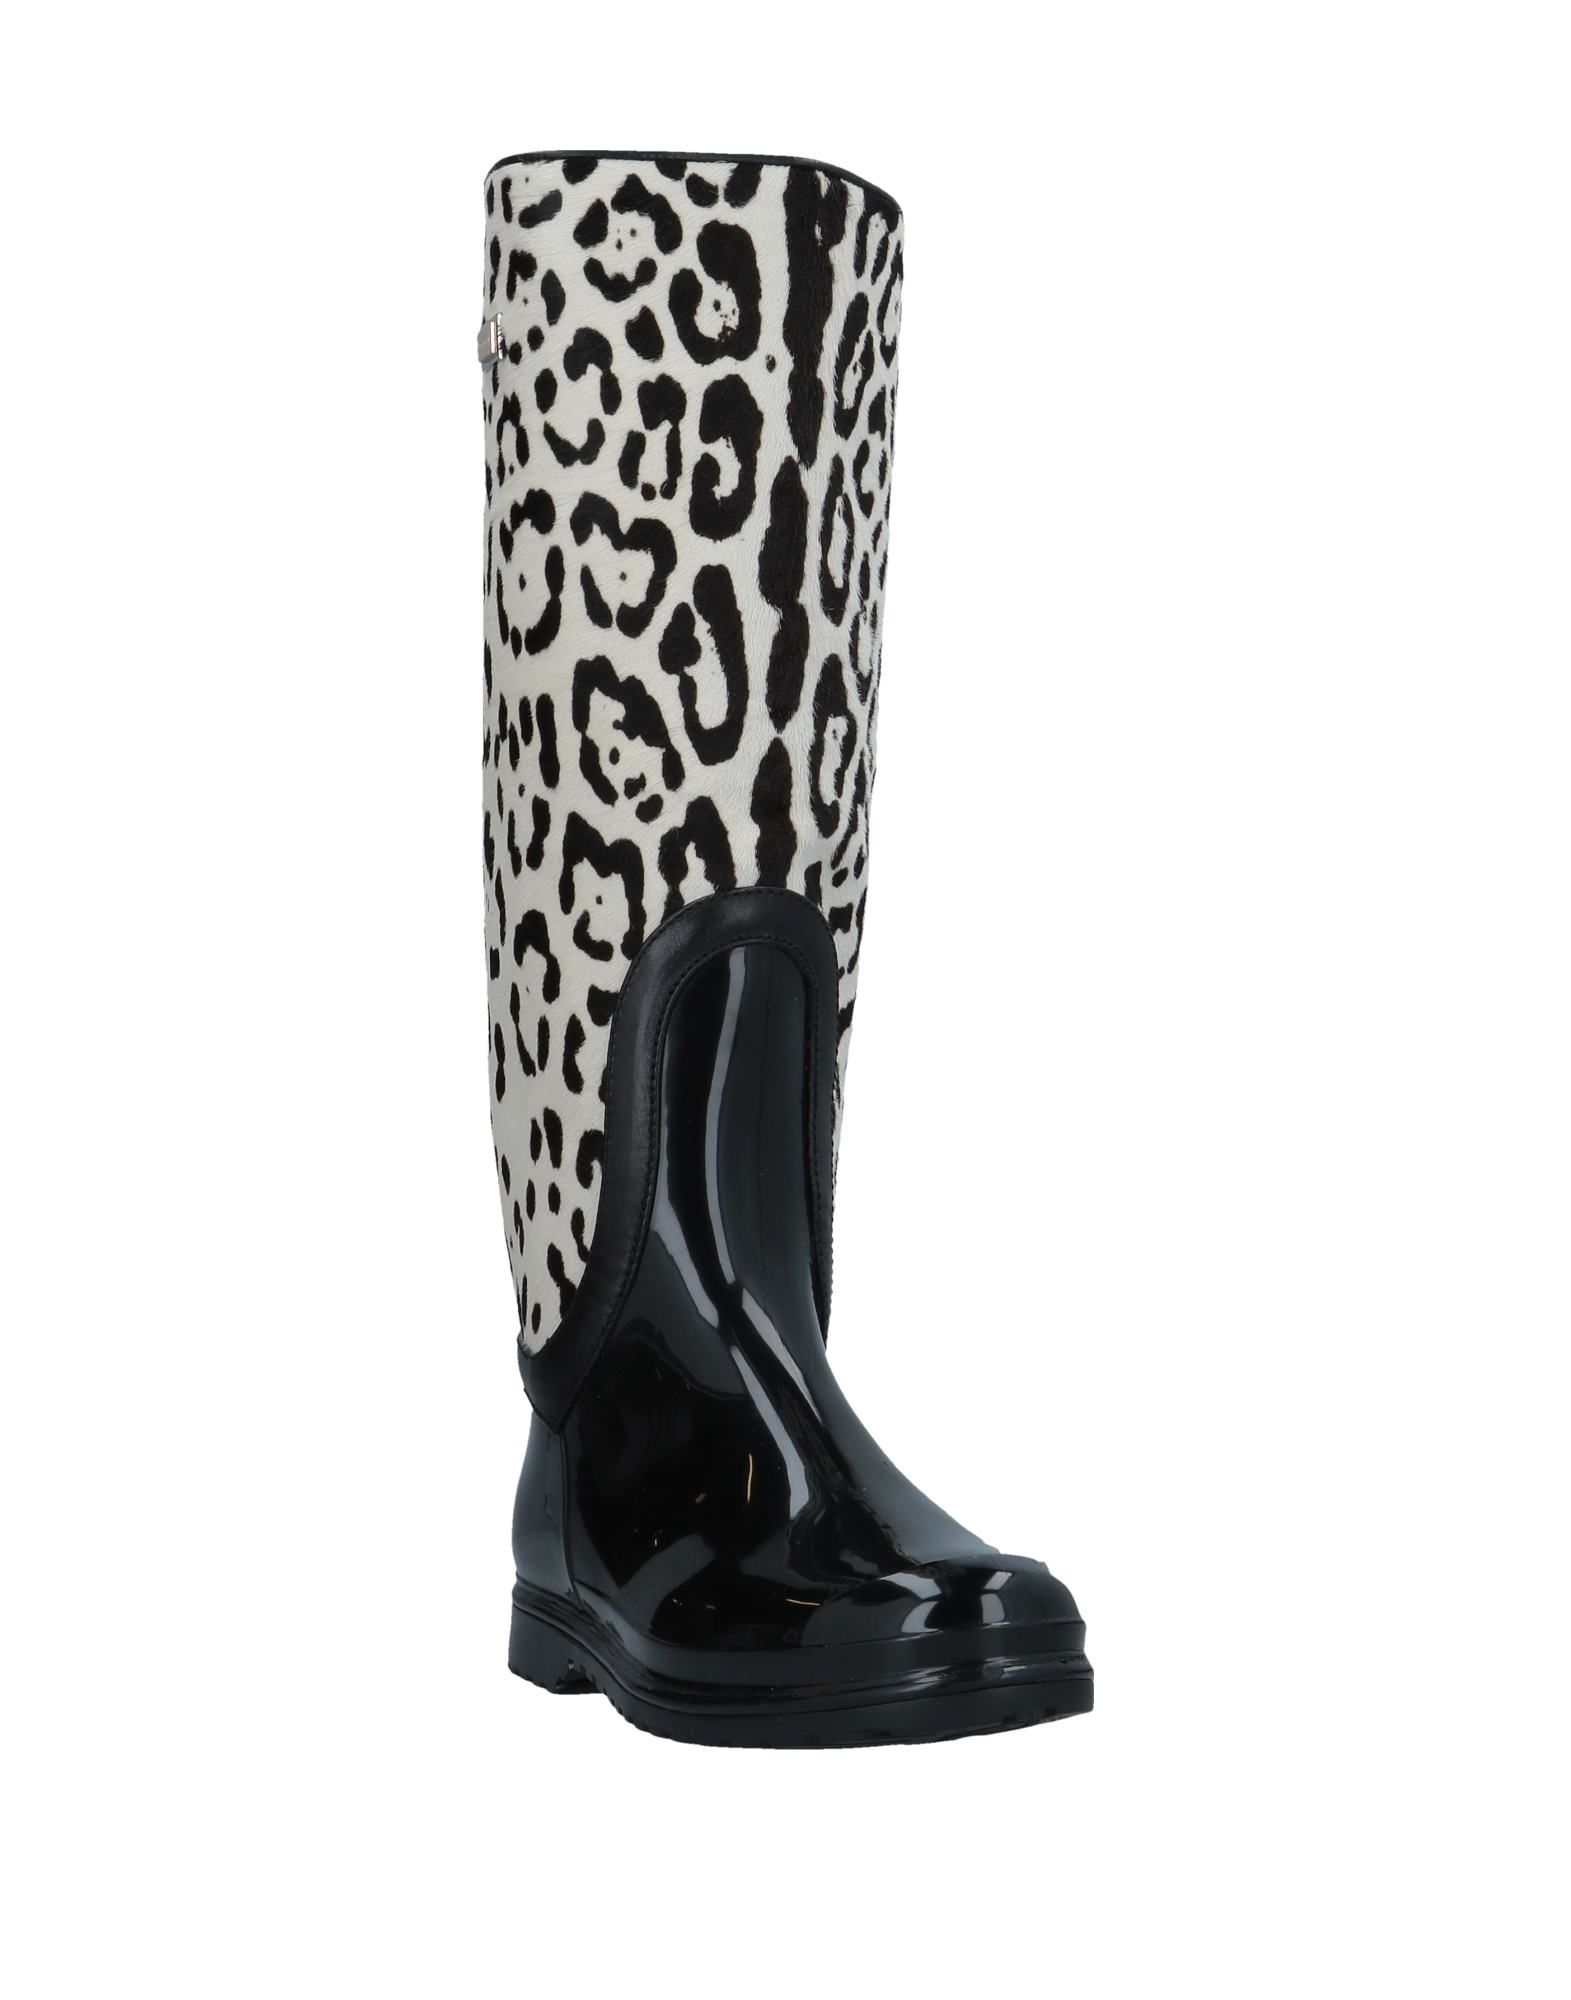 Dolce & Gabbana Stiefel Damen Schuhe  11529017HBGünstige gut aussehende Schuhe Damen 3c1a2a